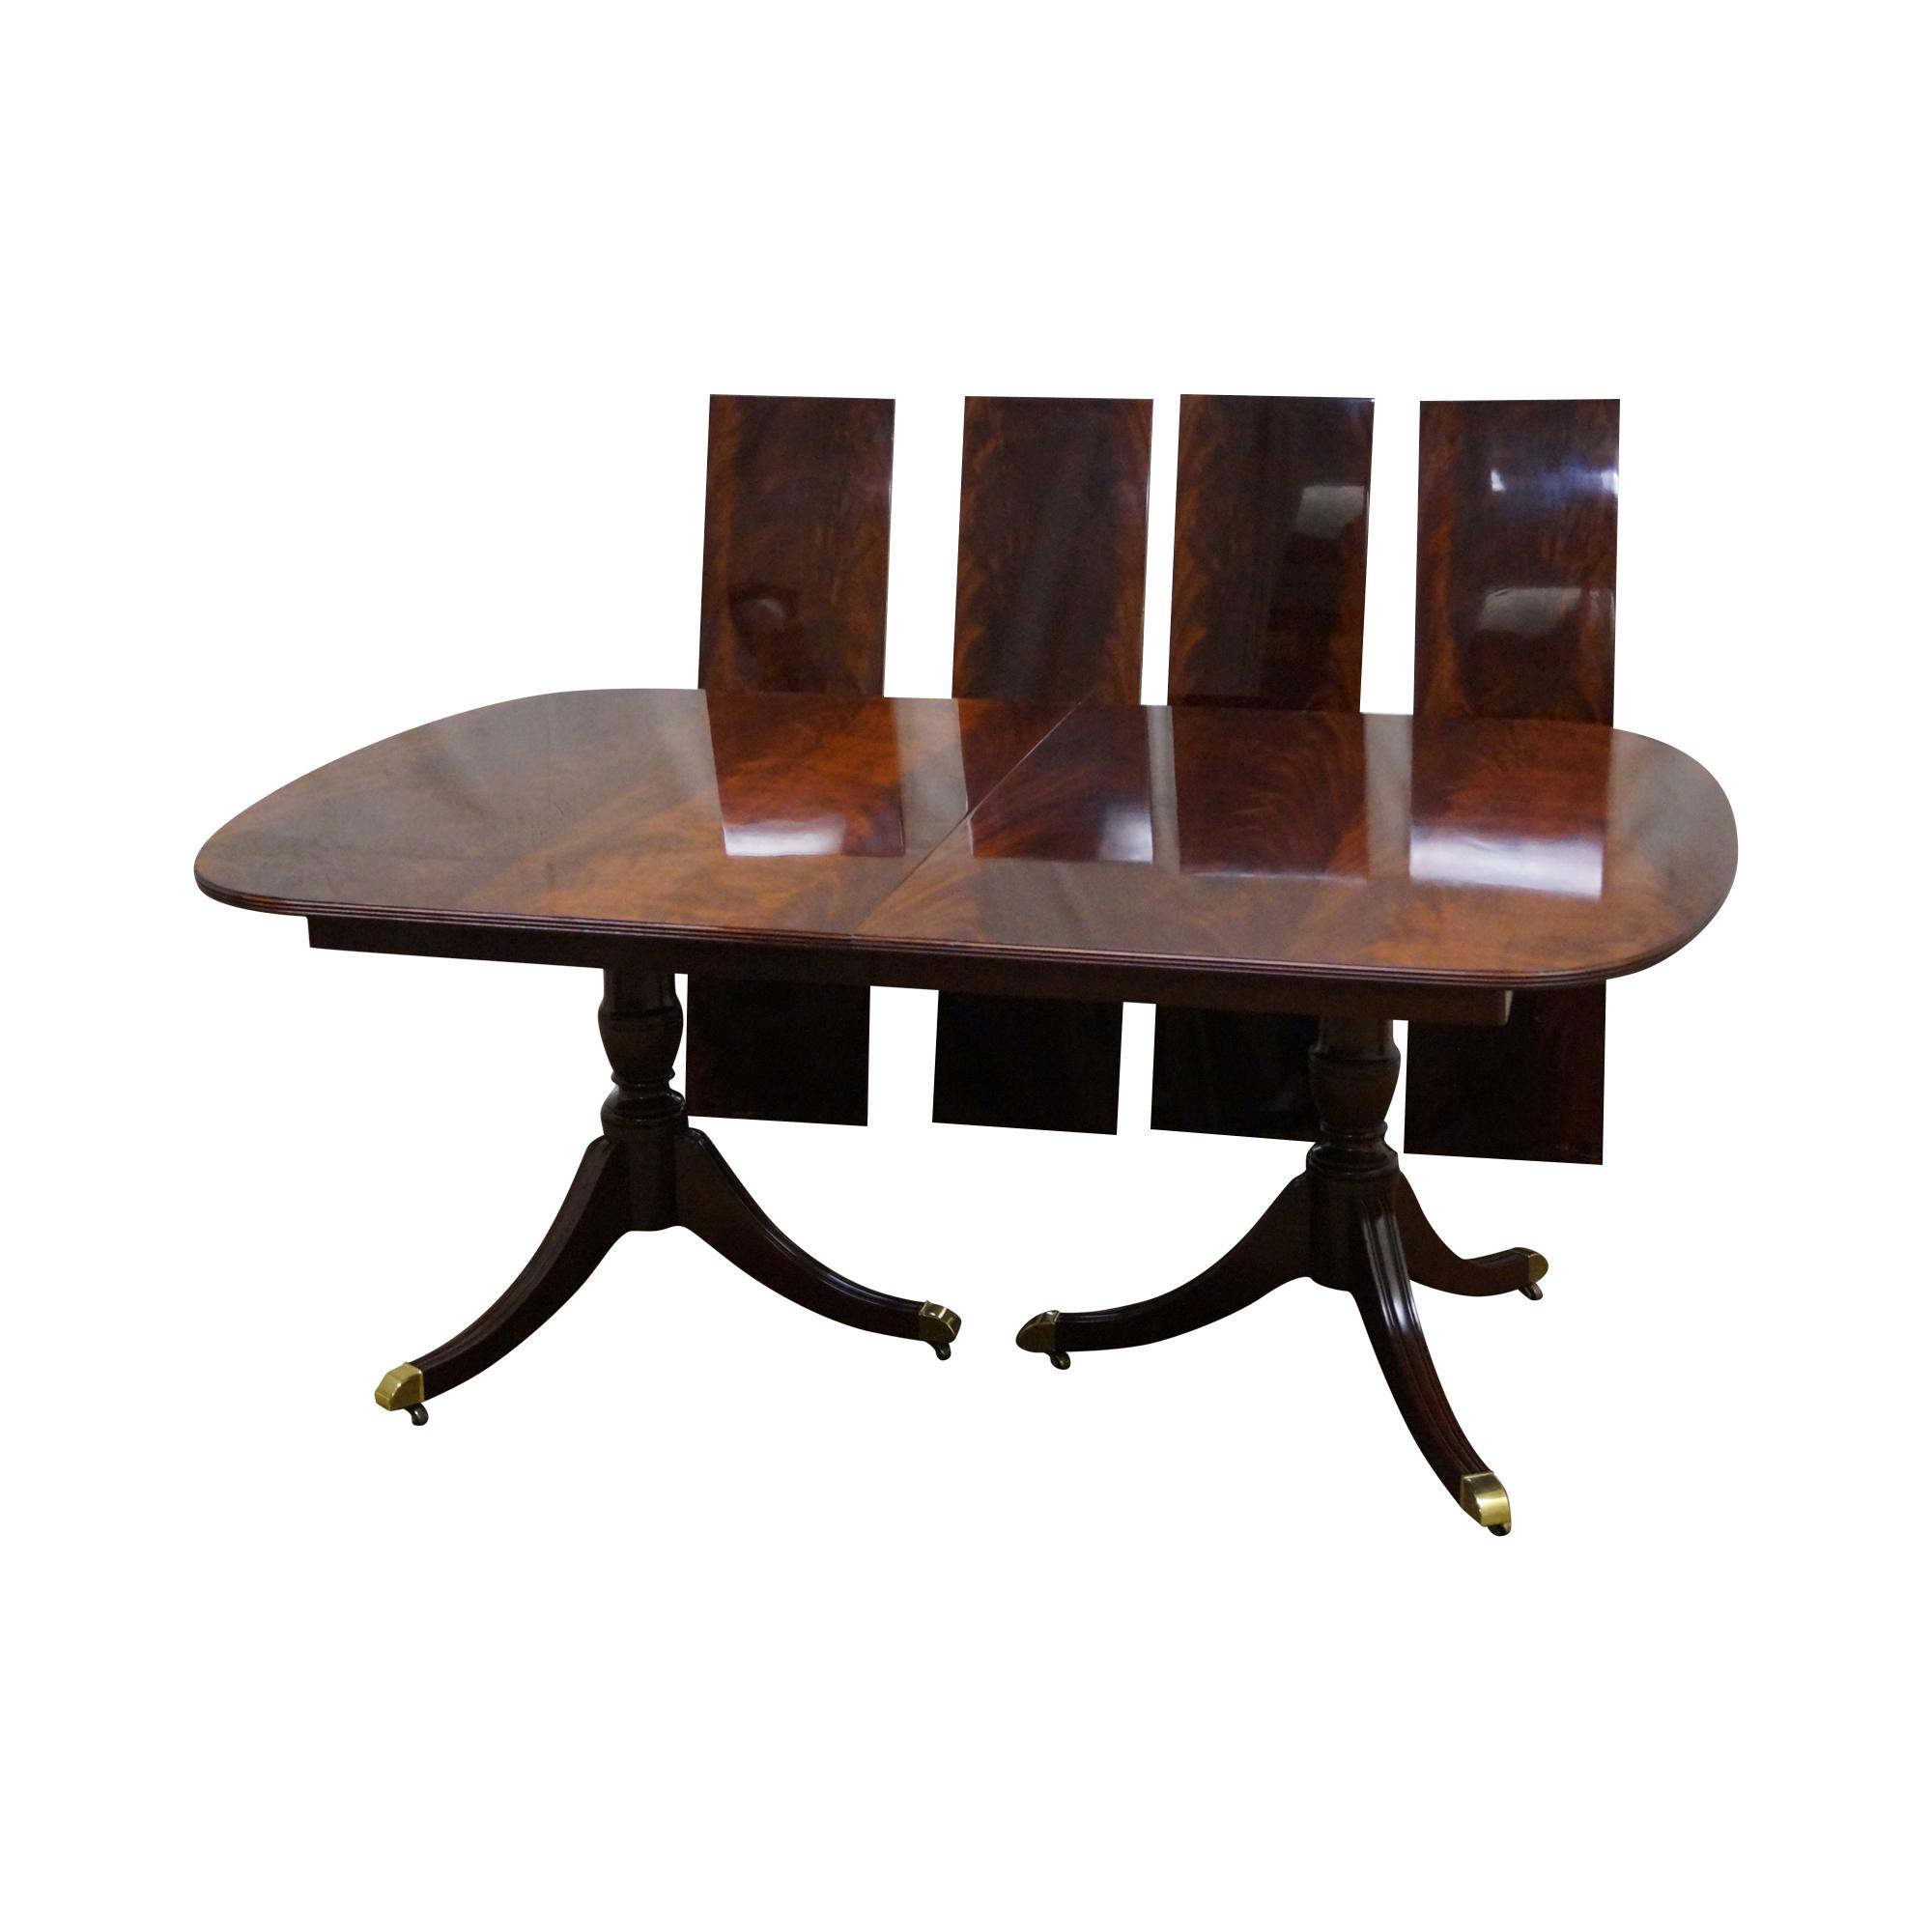 Kindel Flame Mahogany Duncan Phyfe Dining Table Chairish : 5253c4b0 5873 48f3 beab c065724ac000 from www.chairish.com size 2000 x 2000 png 1227kB